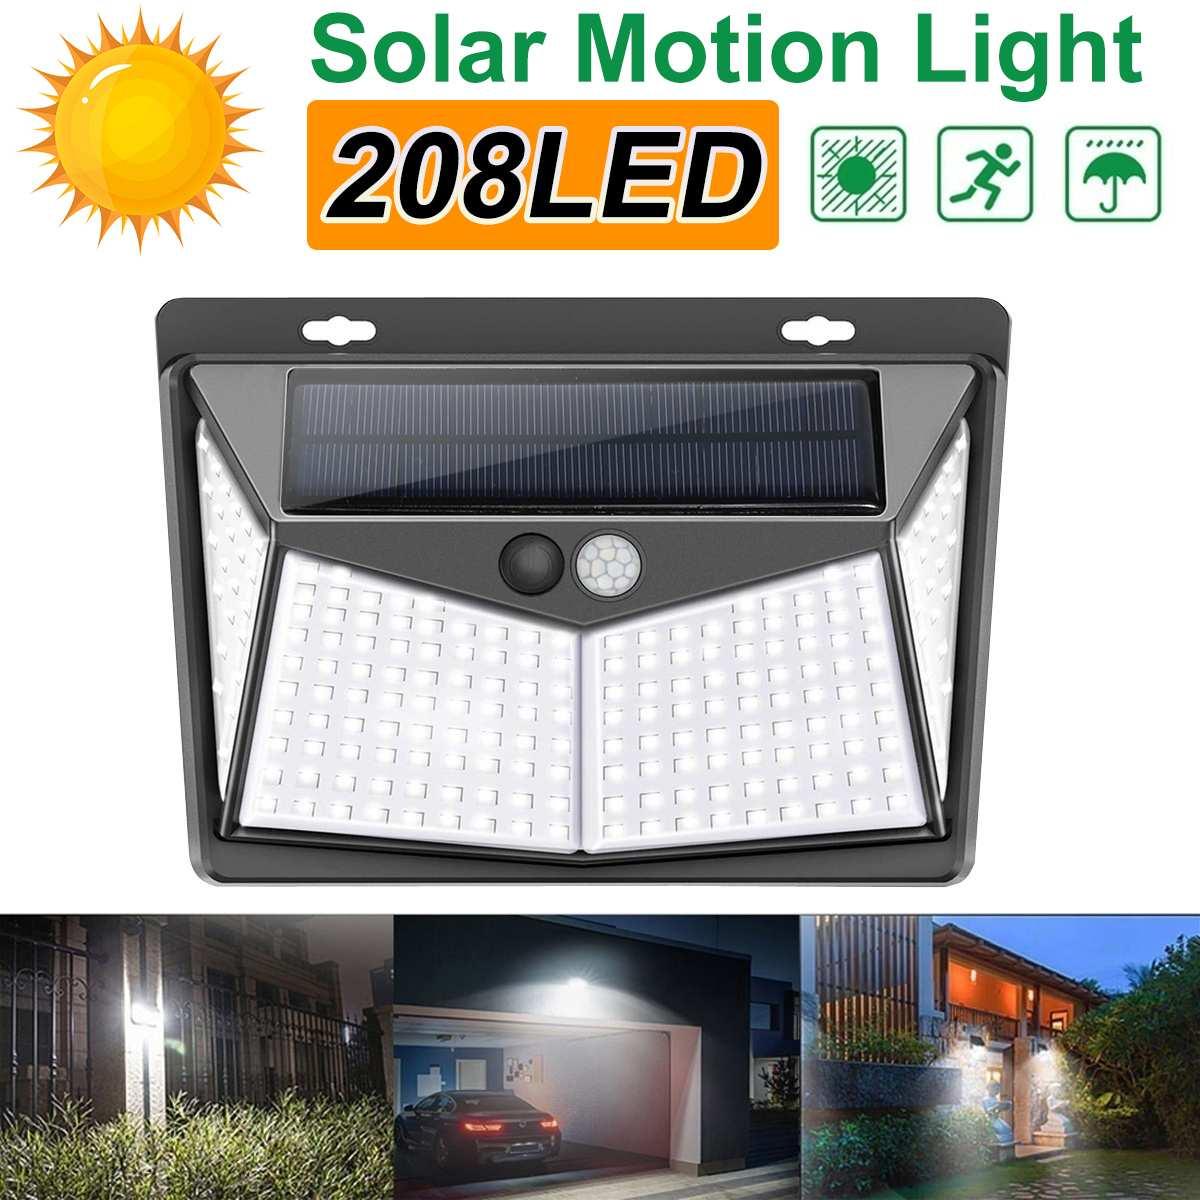 208 LED Solar Light 3 Mode Outdoor Solar Lamp PIR Motion Sensor Wall Light IP65 Solar Powered Sunlight For Garden Decoration